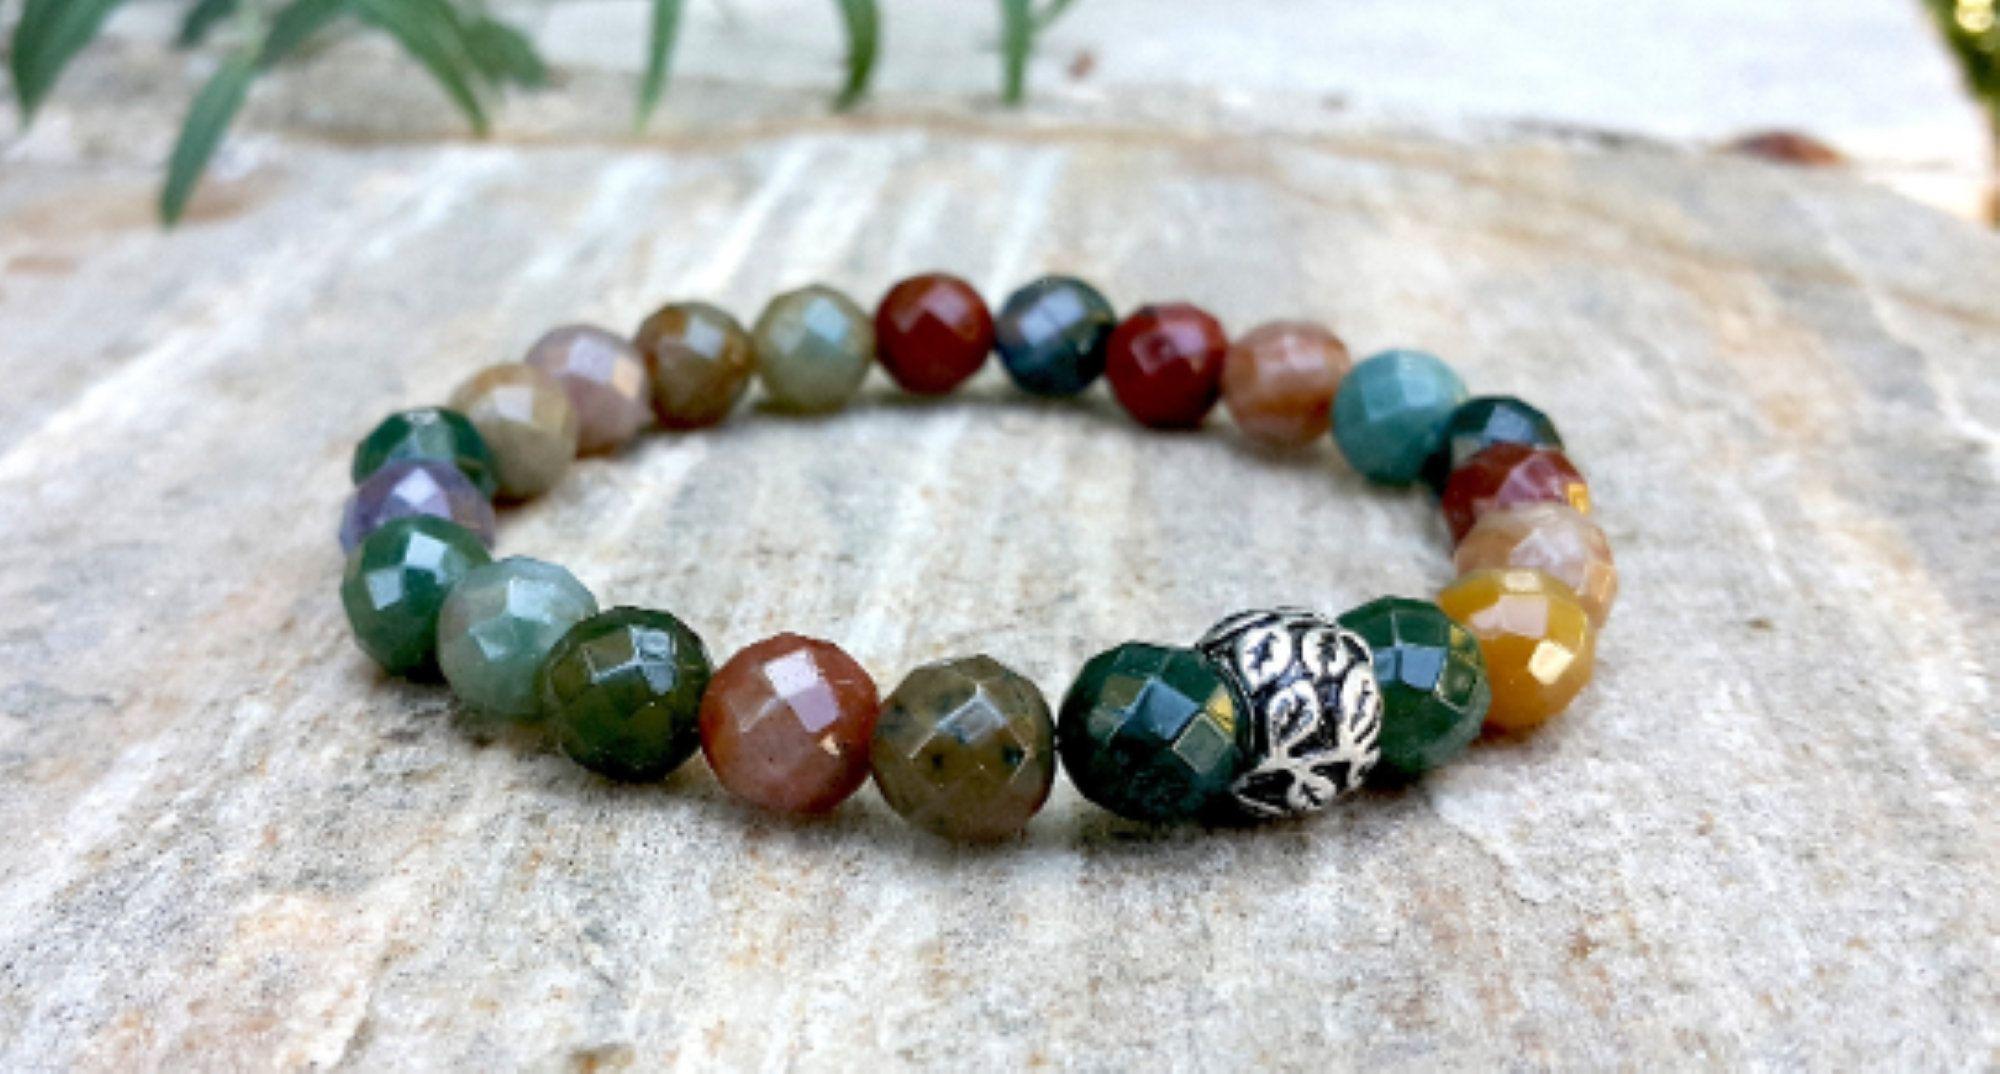 Indian agate gemstone bracelet with silver leaf bead 8mm